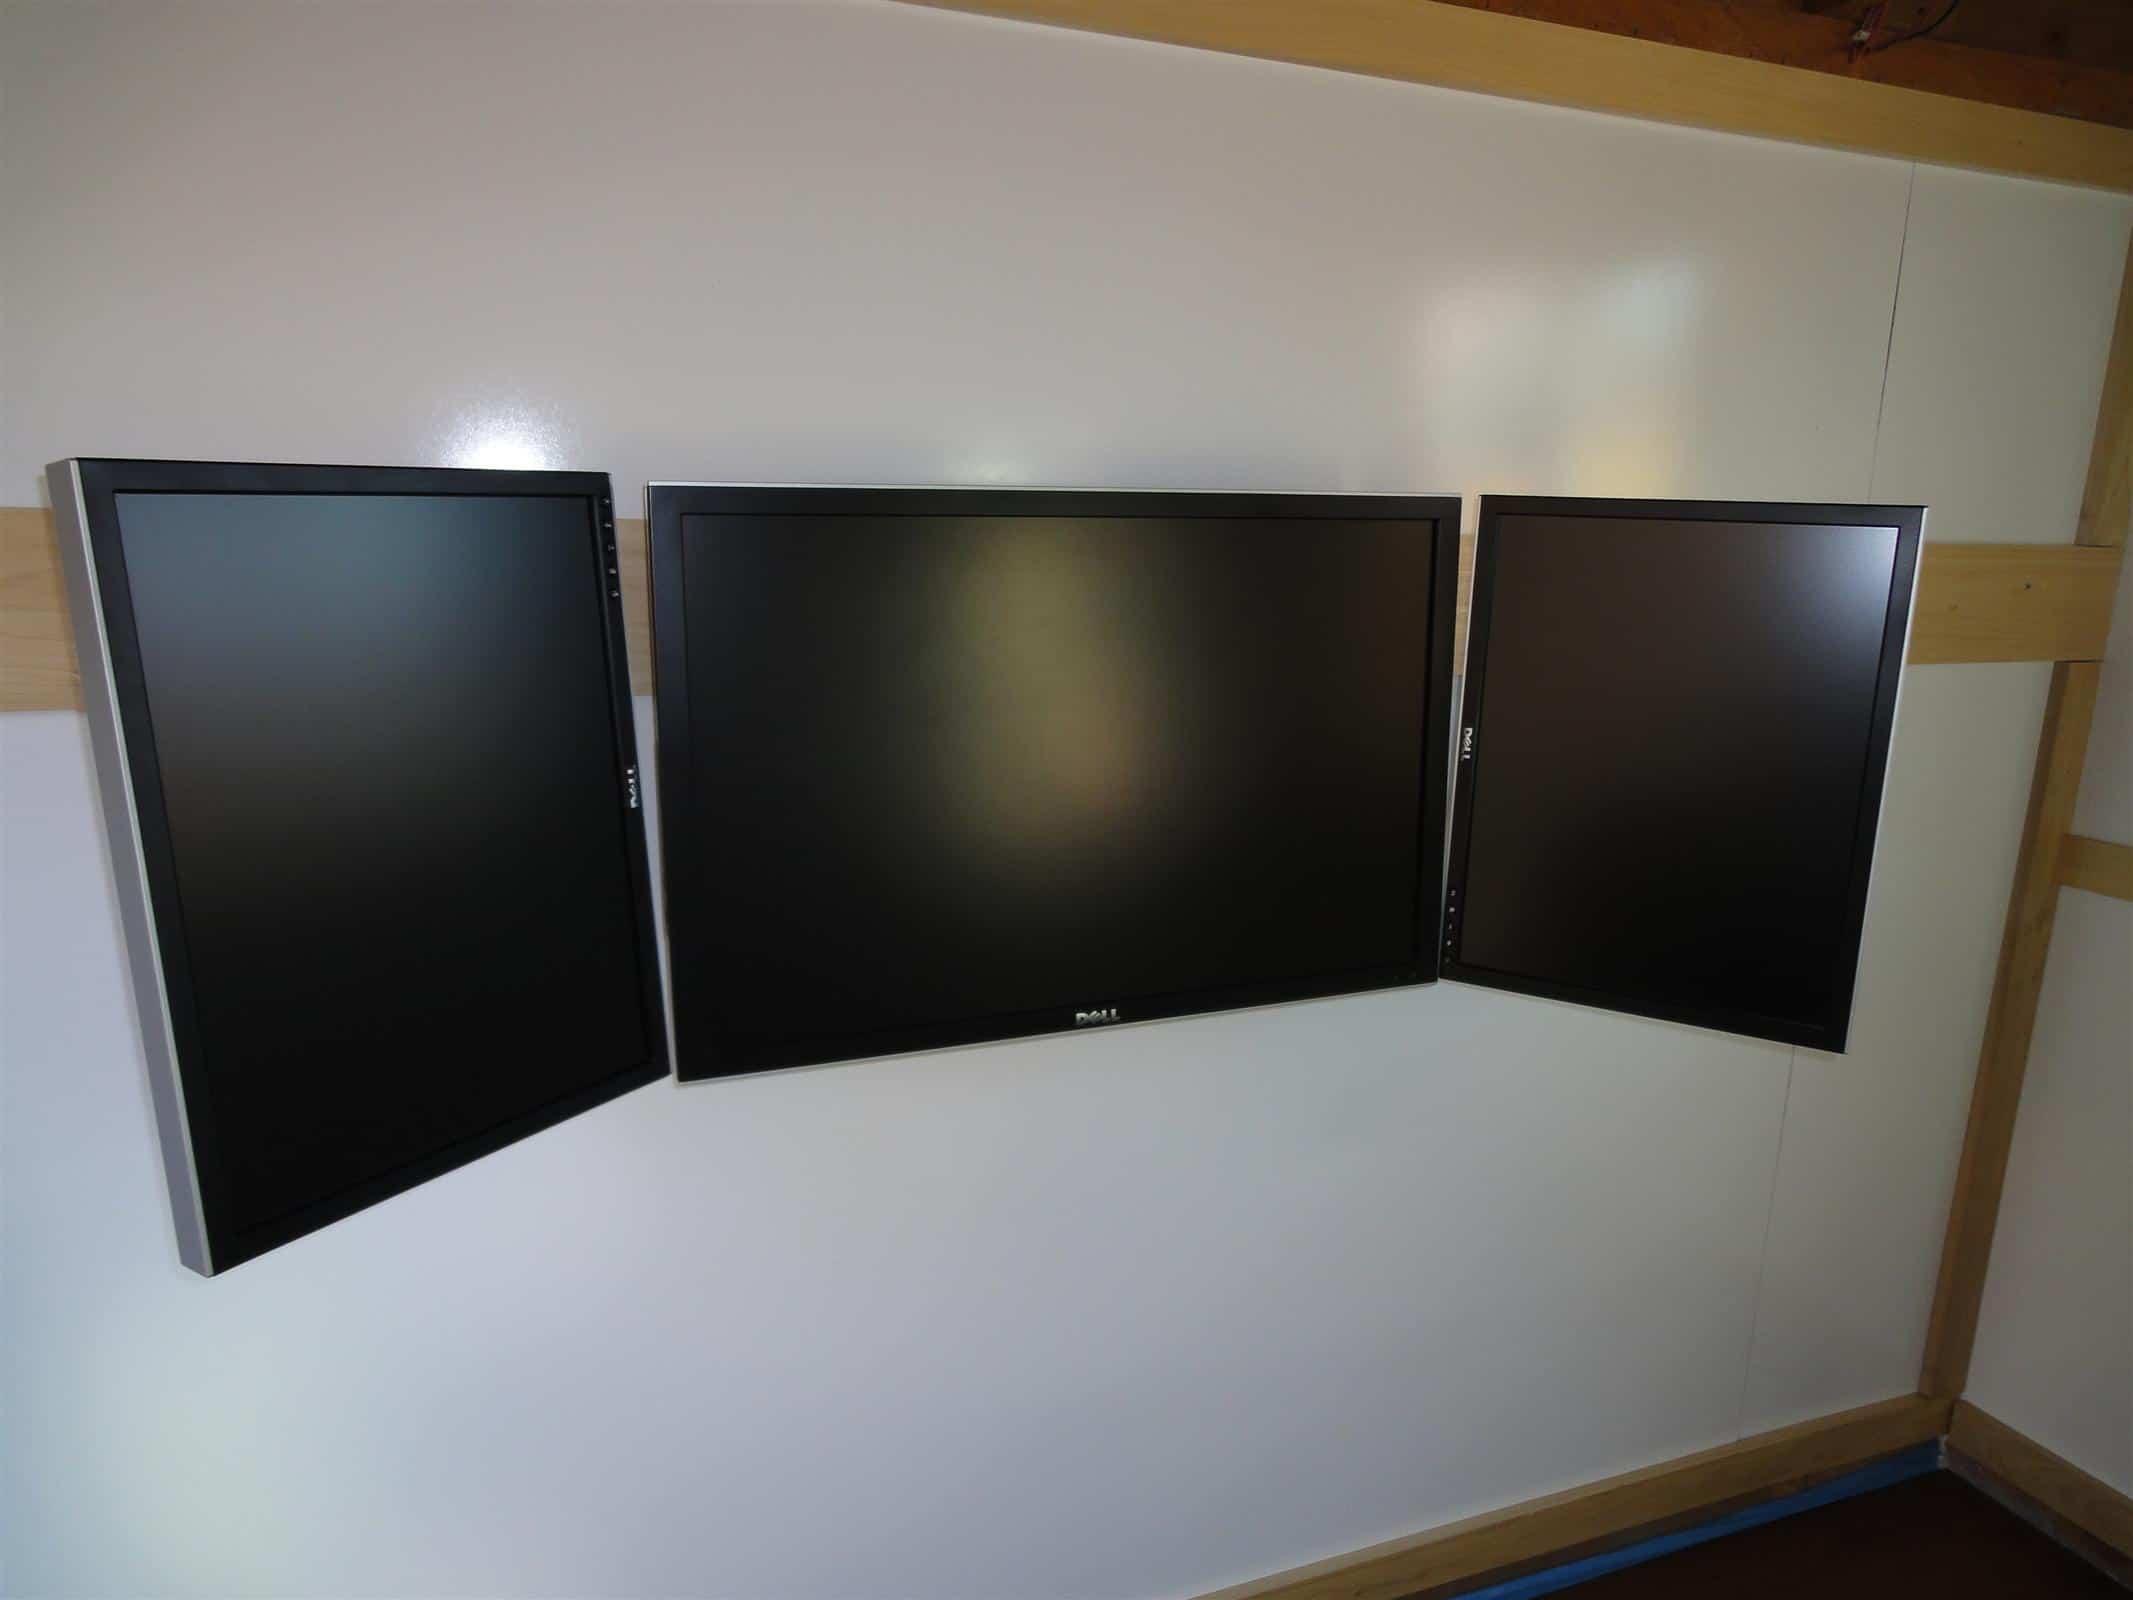 Triple monitors mounted